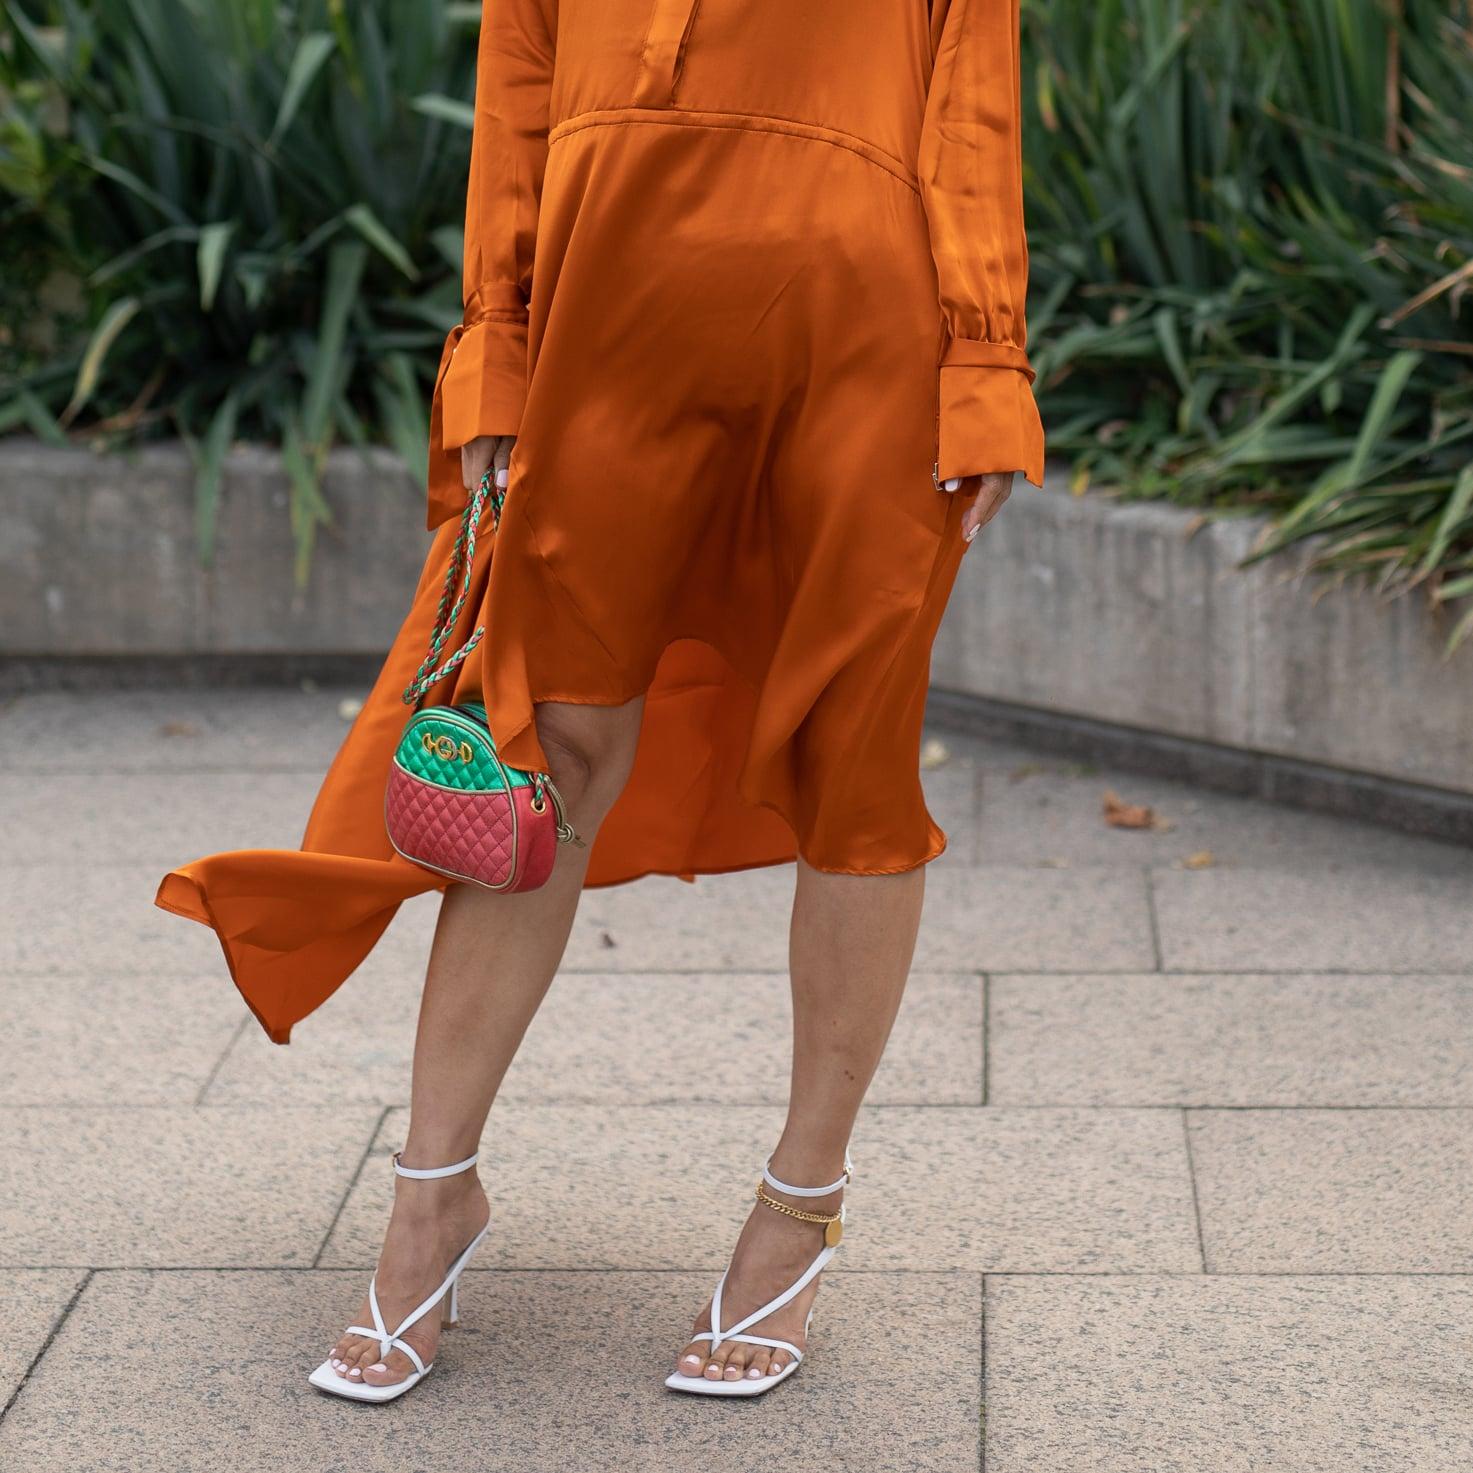 Square-Toe Heel Trend | POPSUGAR Fashion